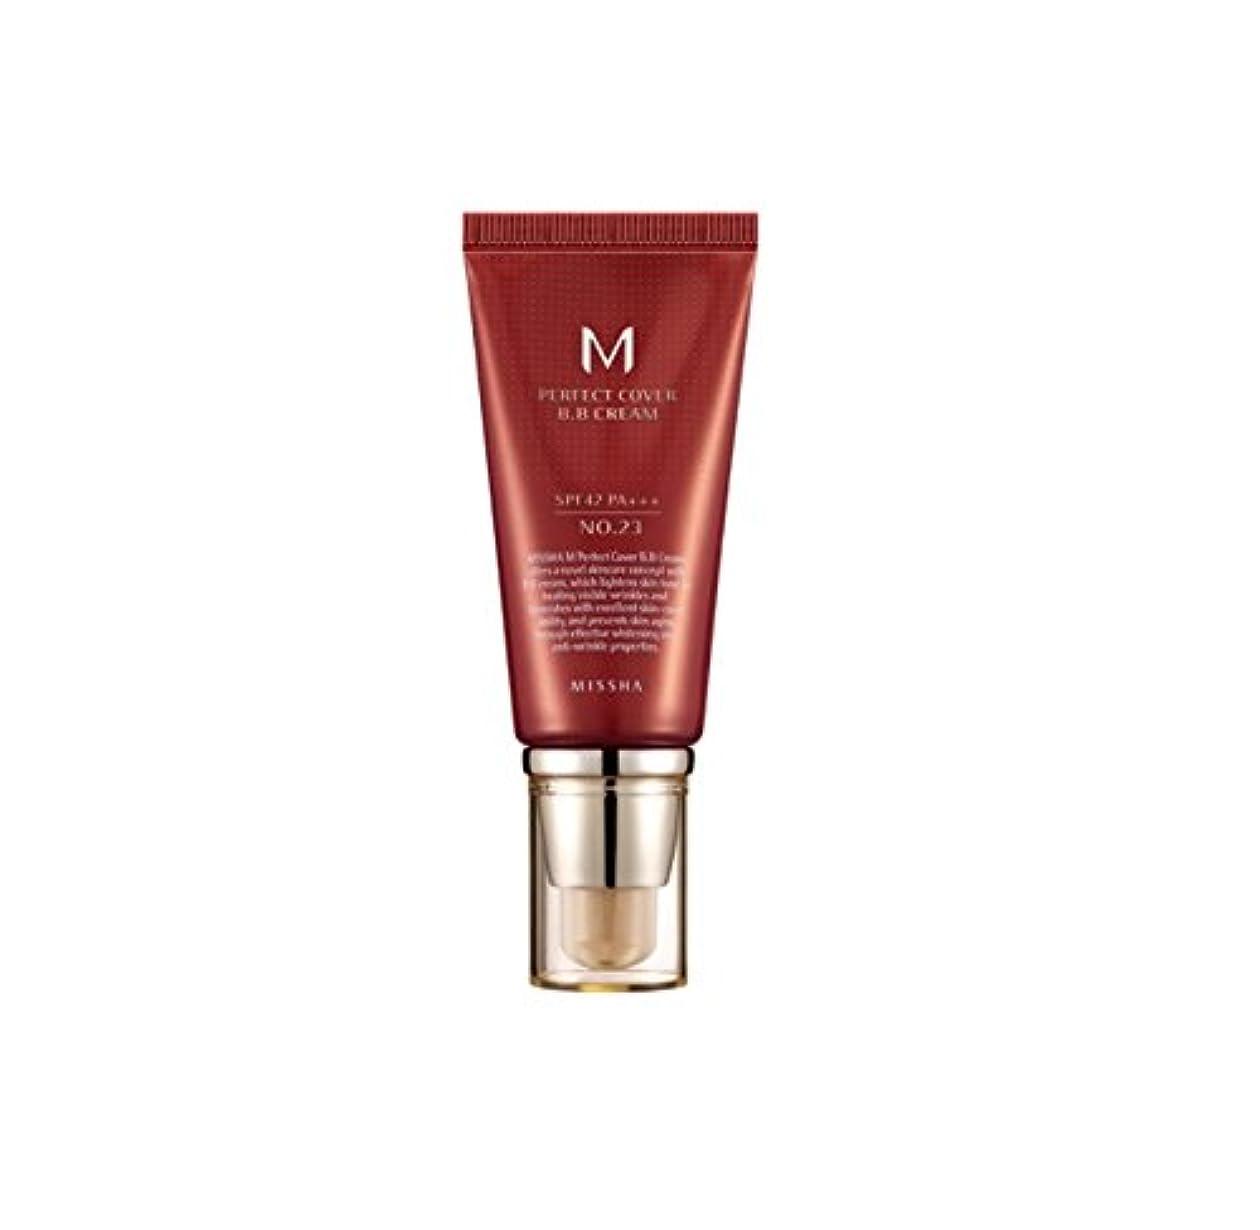 MISSHA M Perfect Cover BB Cream No.23 Natural Beige SPF42 PA+++ (50ml)